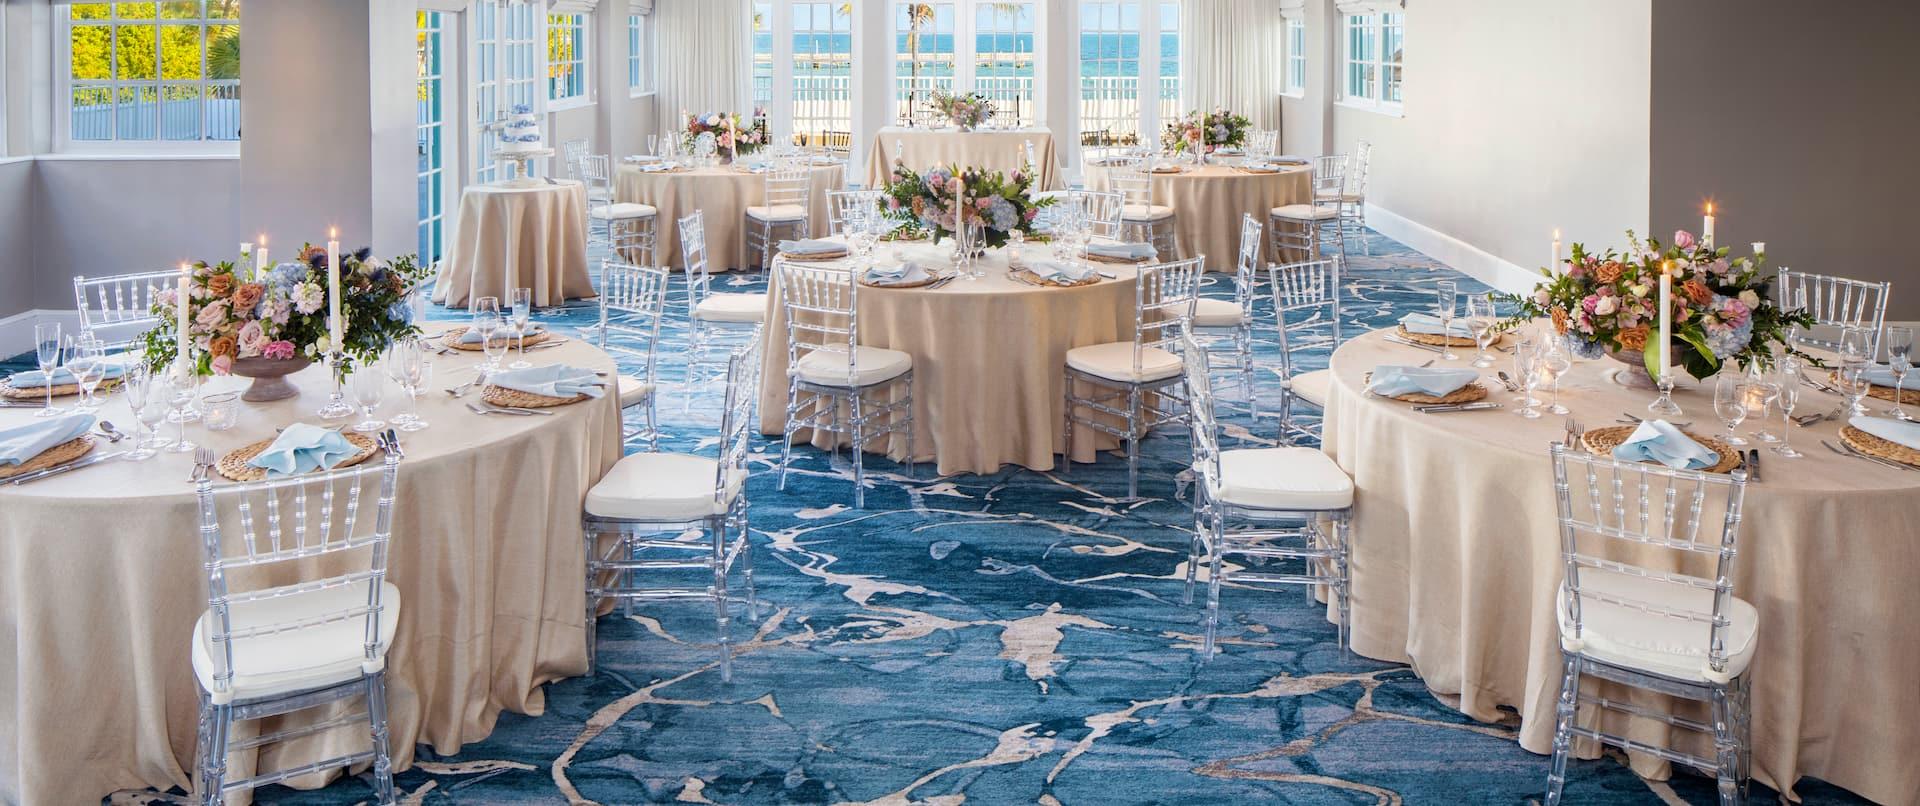 Caribe Ballroom Setup for a Wedding Reception